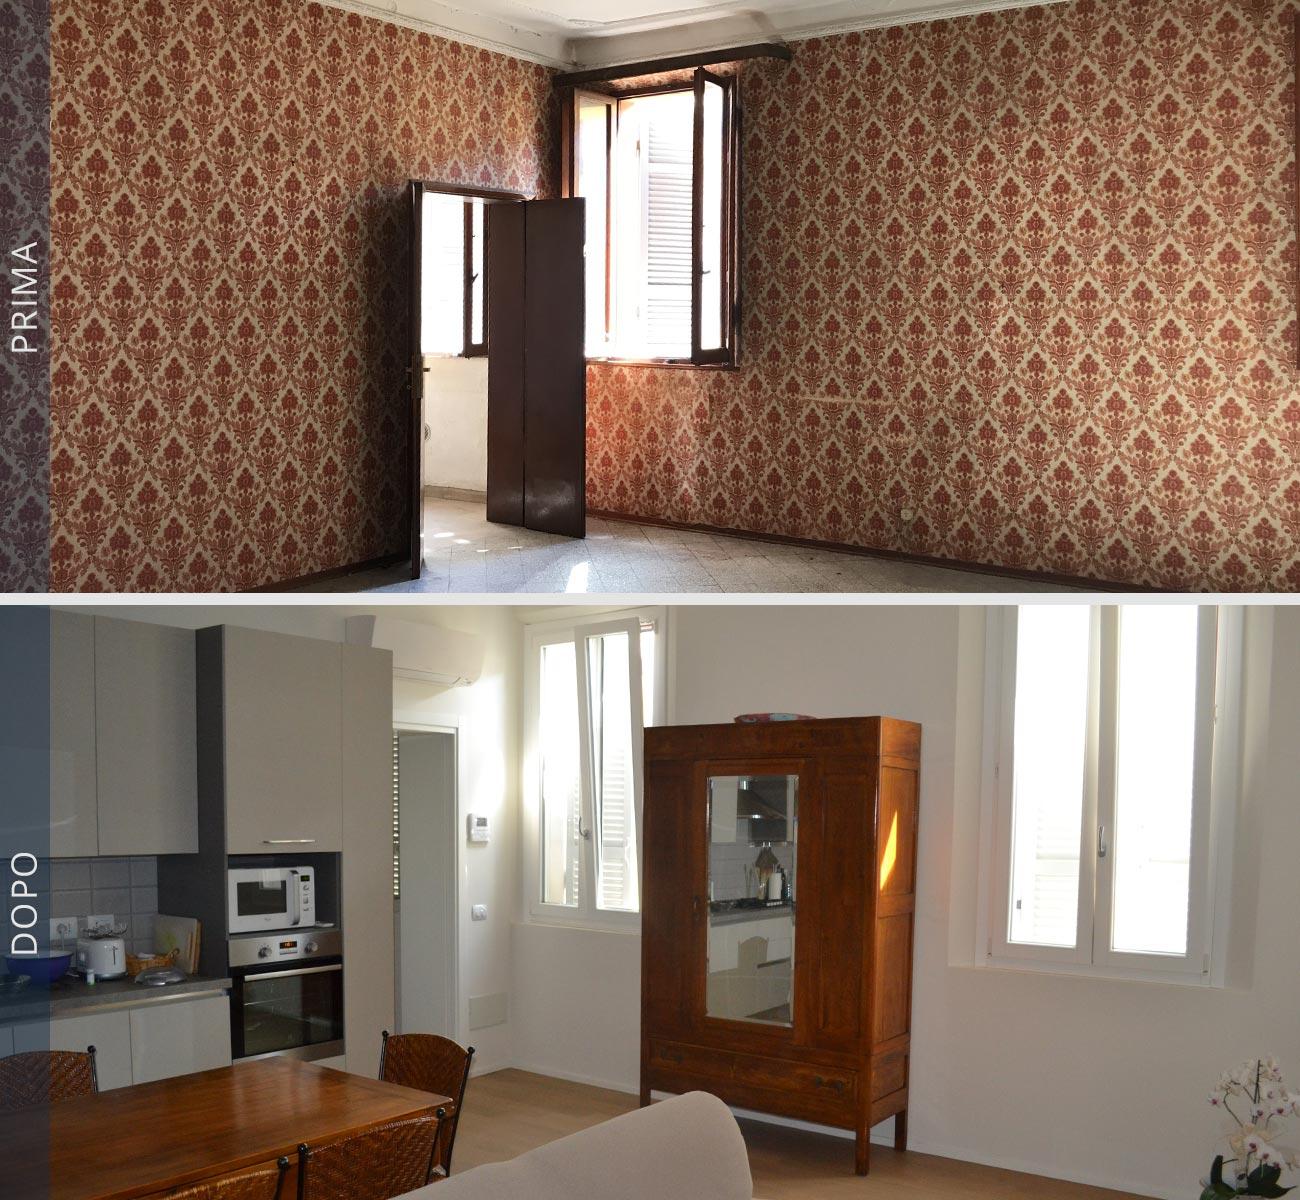 residenziale-ravenna_studio-tb-02